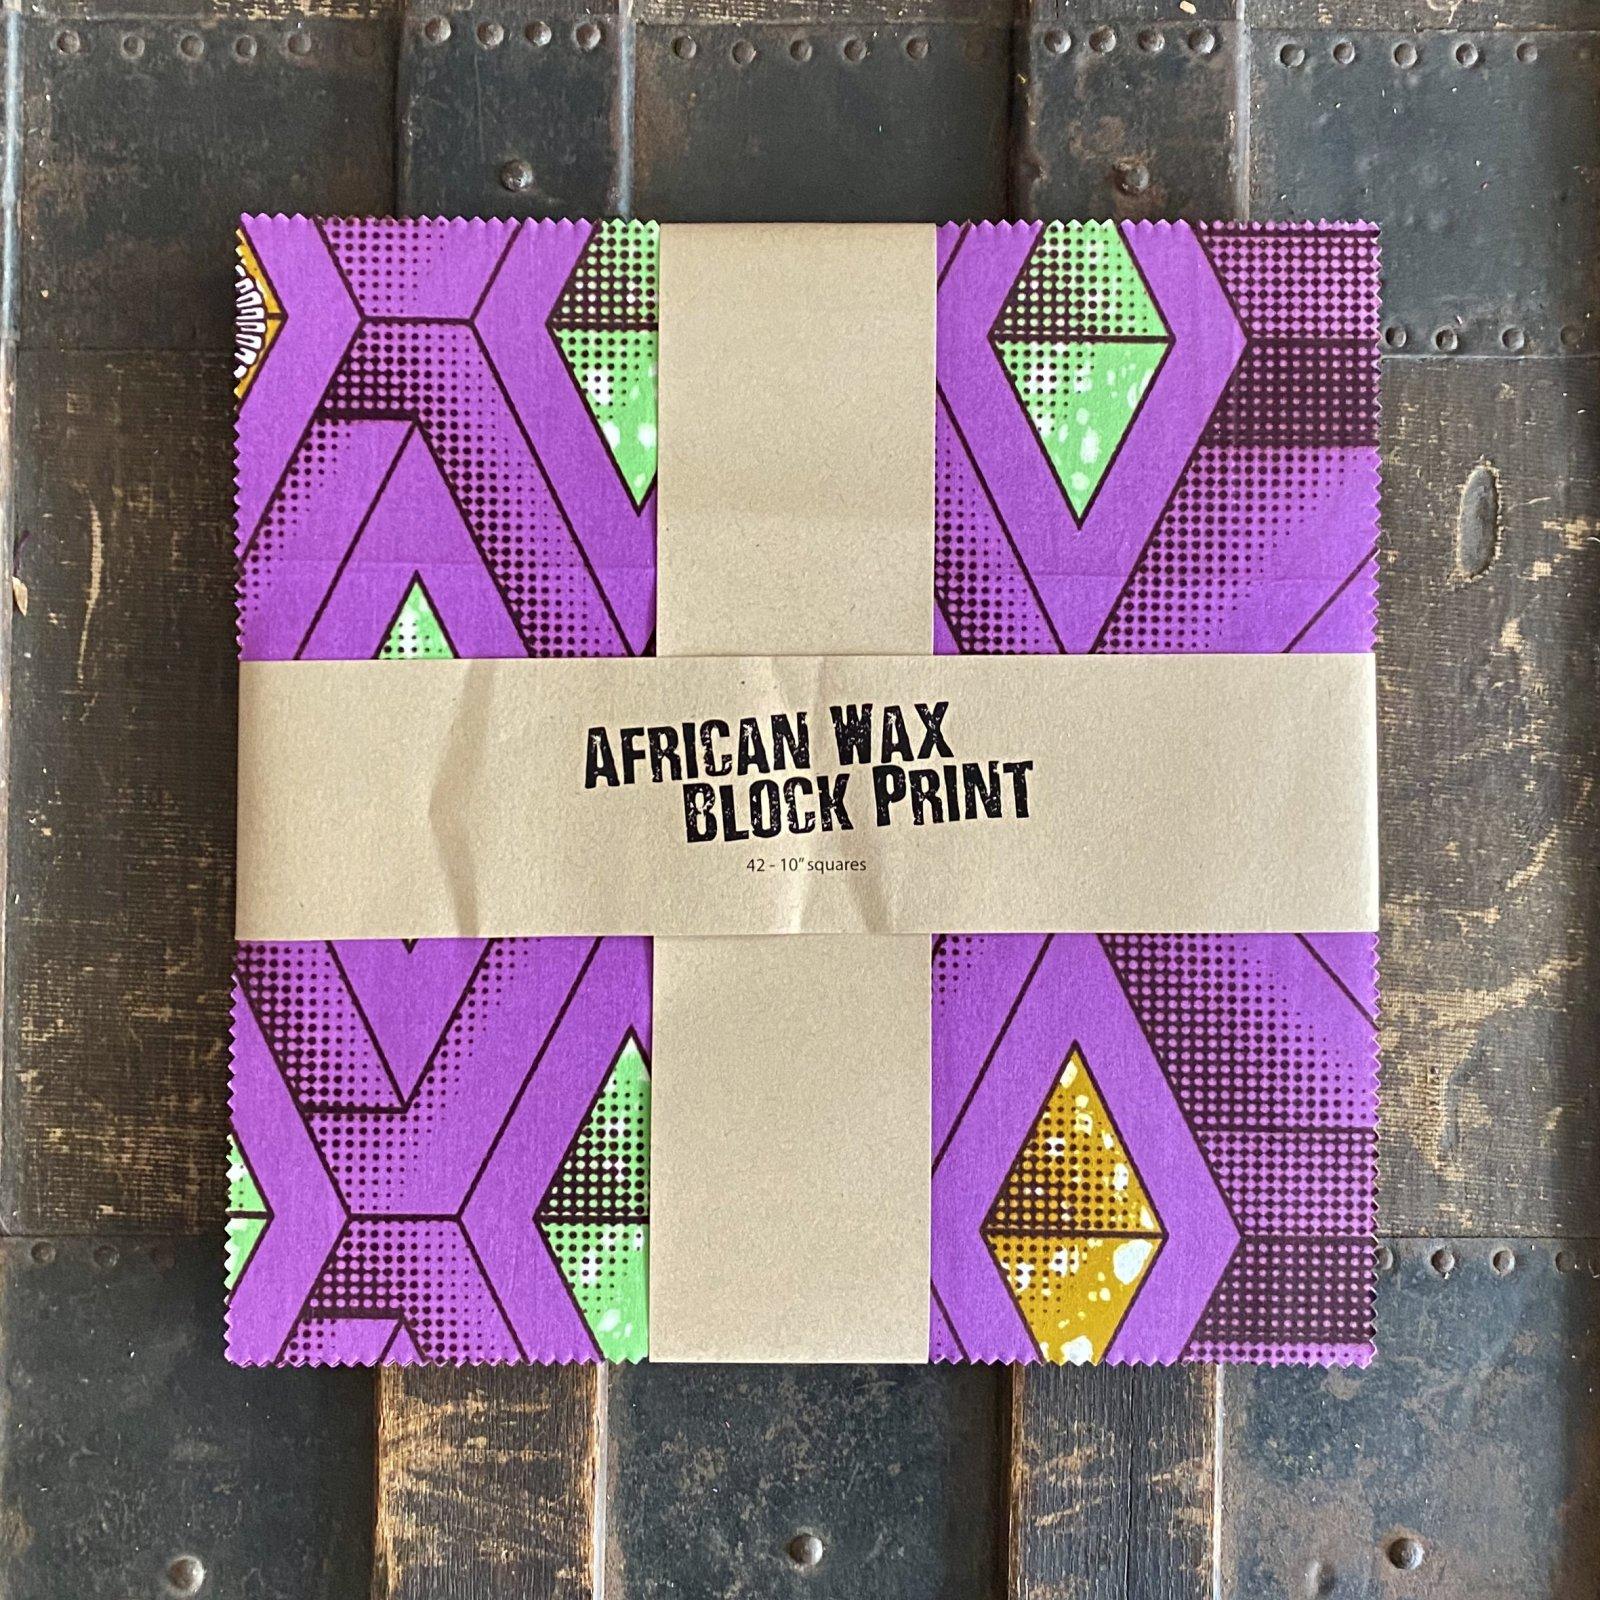 African Wax Block Print - (42) 10 squares